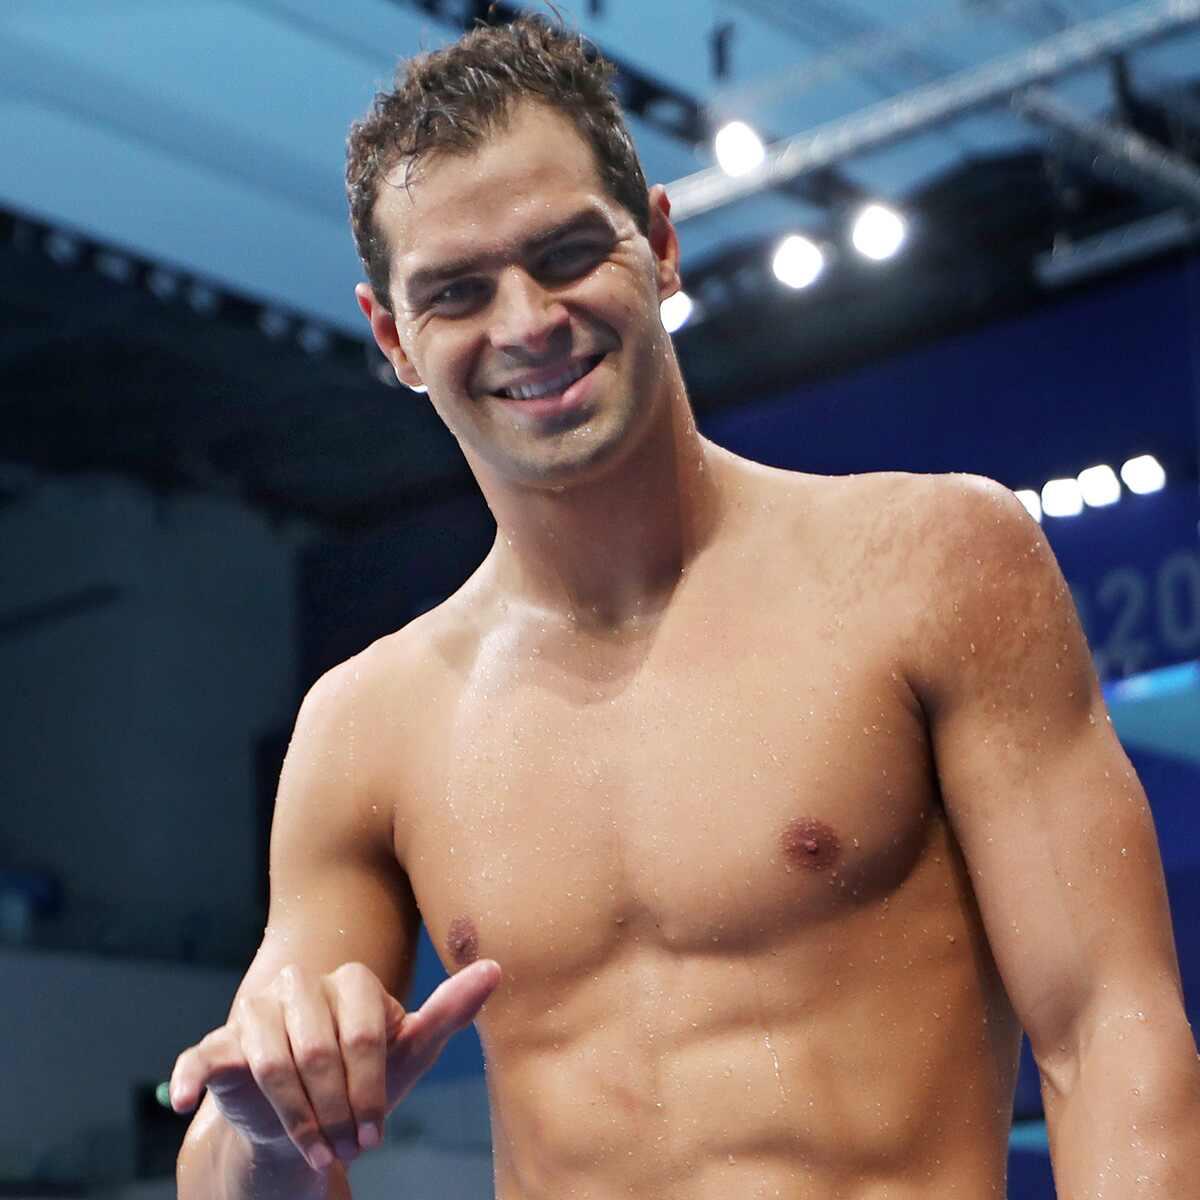 Michael Andrew, USA, 2020 Tokyo Olympics, Candids